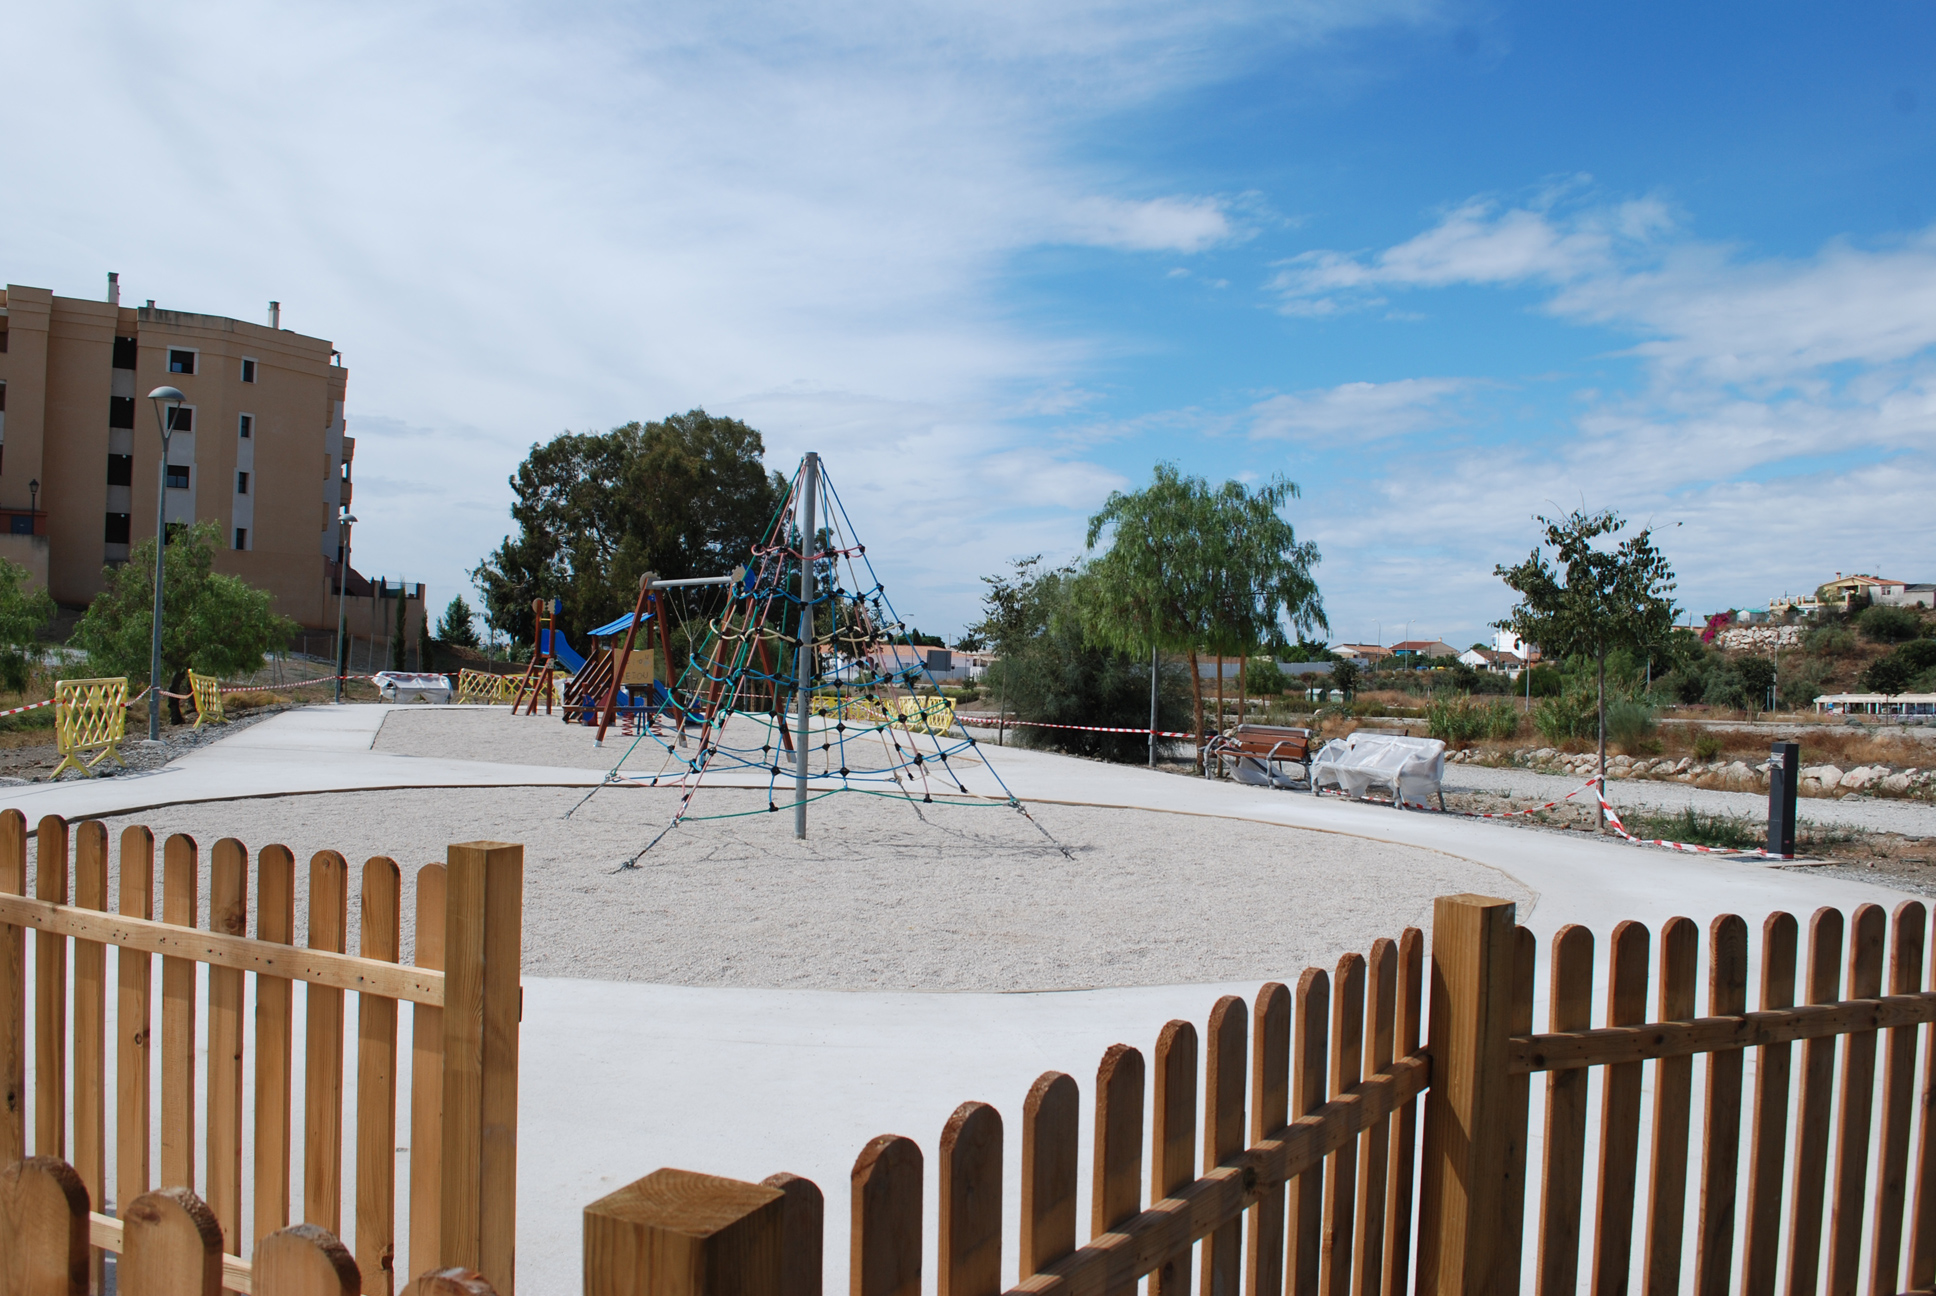 Arrinconados Parque Infantil